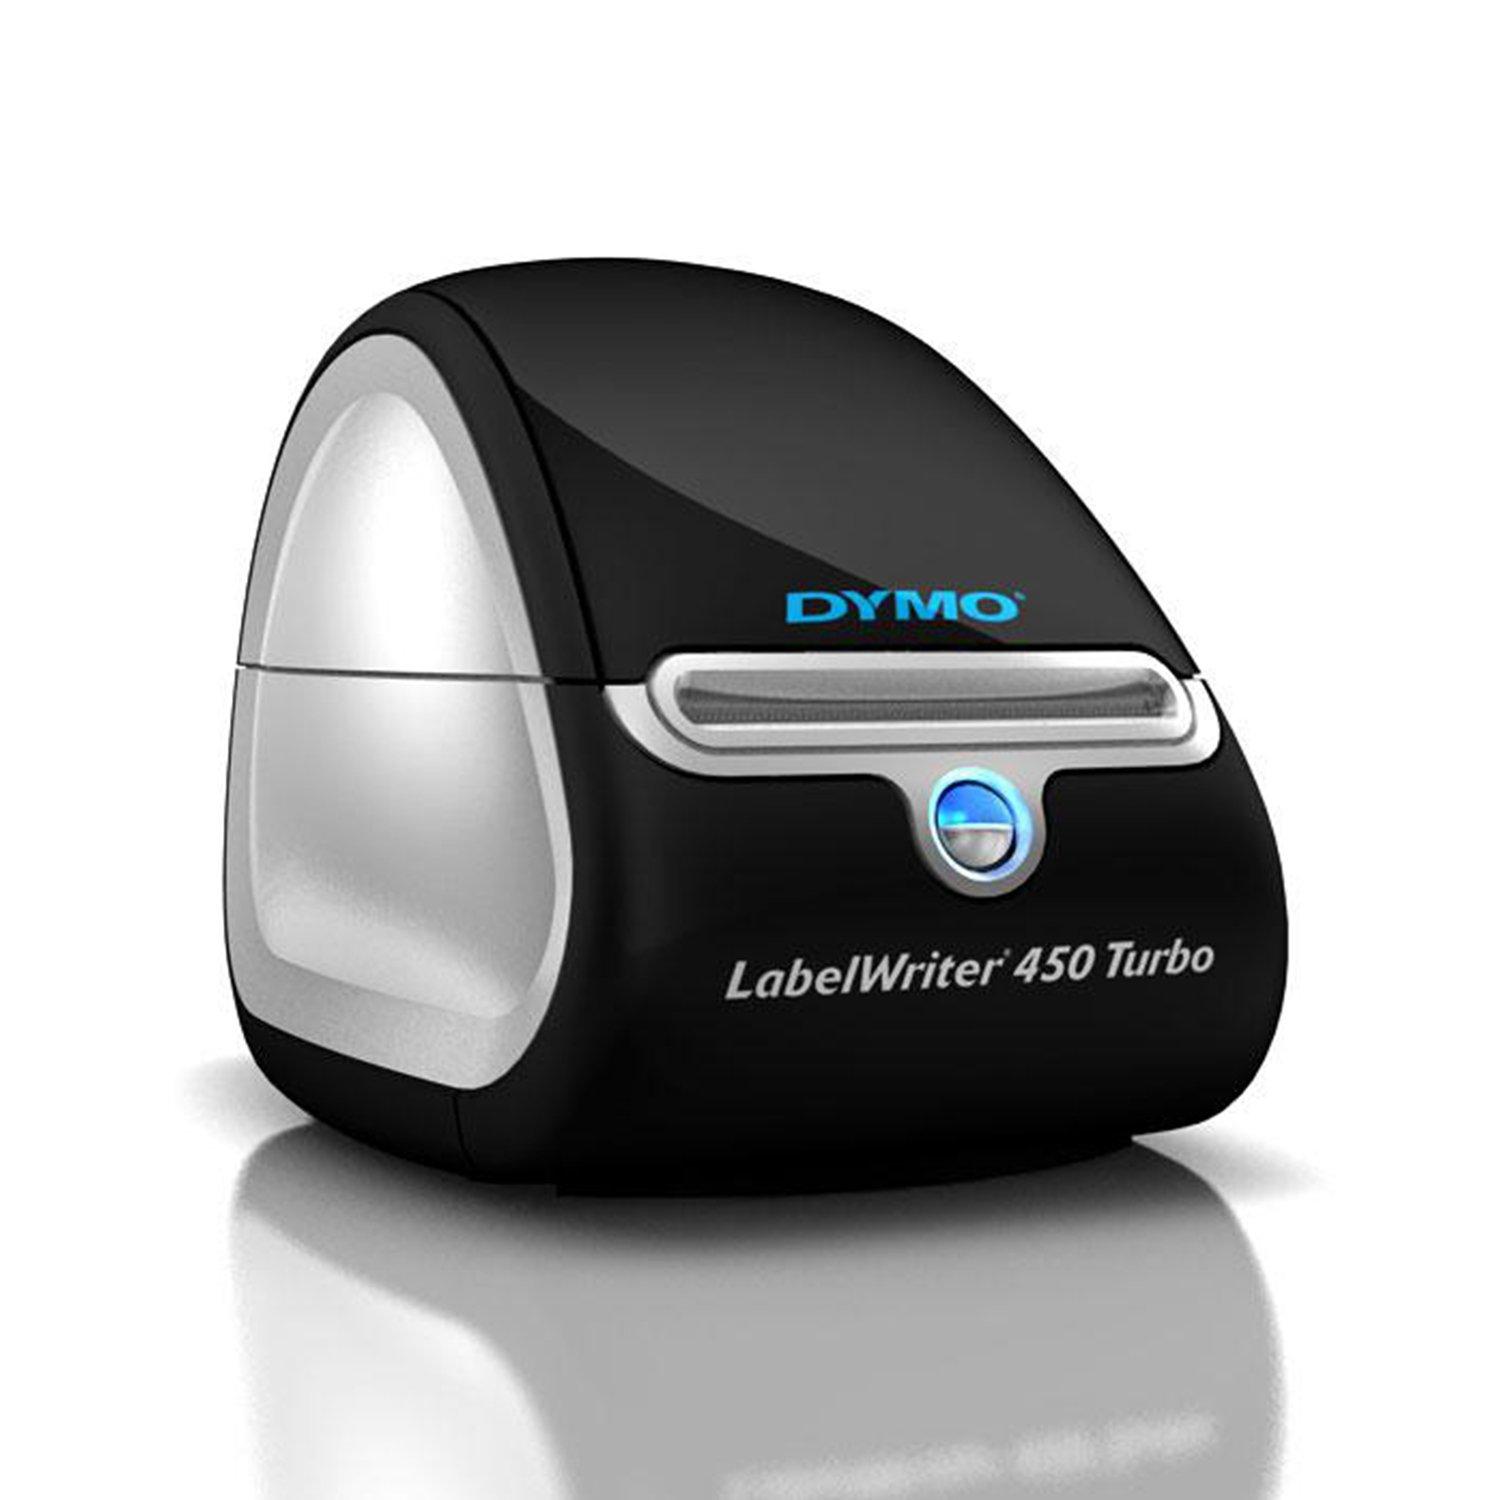 Dymo LabelWriter 450 Turbo Impresora de etiquetas térmica product image